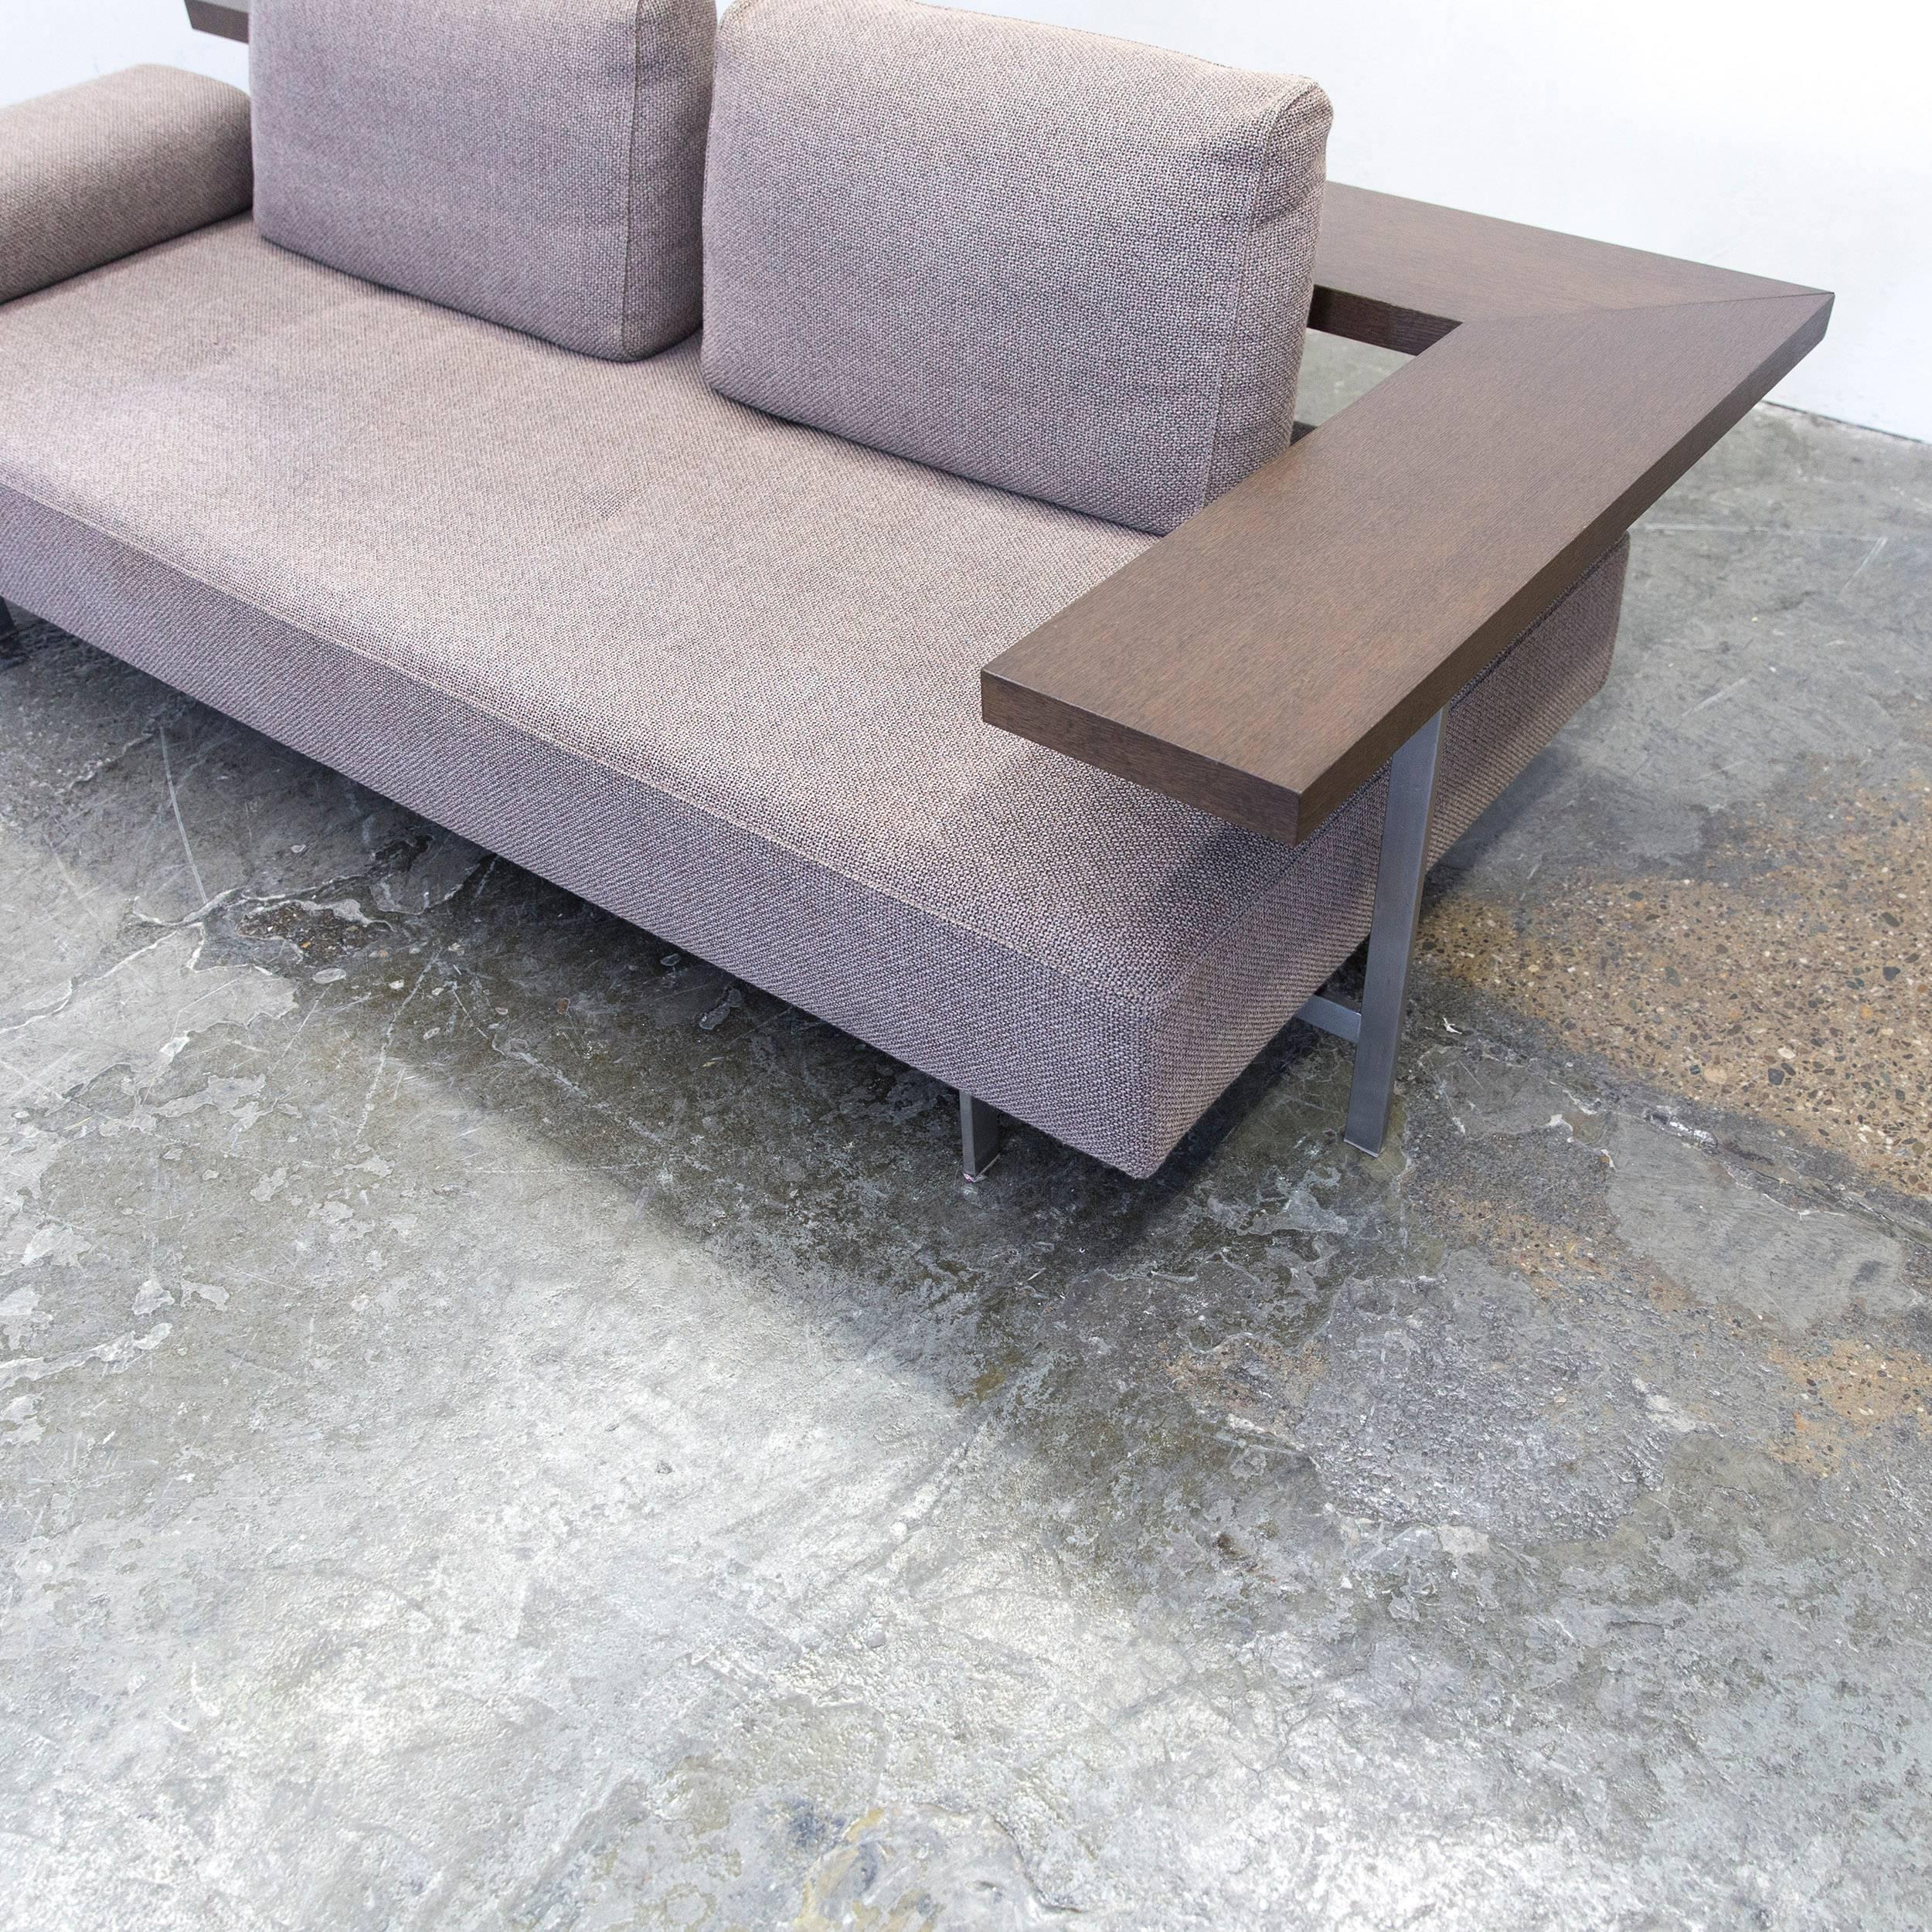 Sofa Mit Grau Awesome Ikea Sofa Grau Bc Von Design Sofa Und